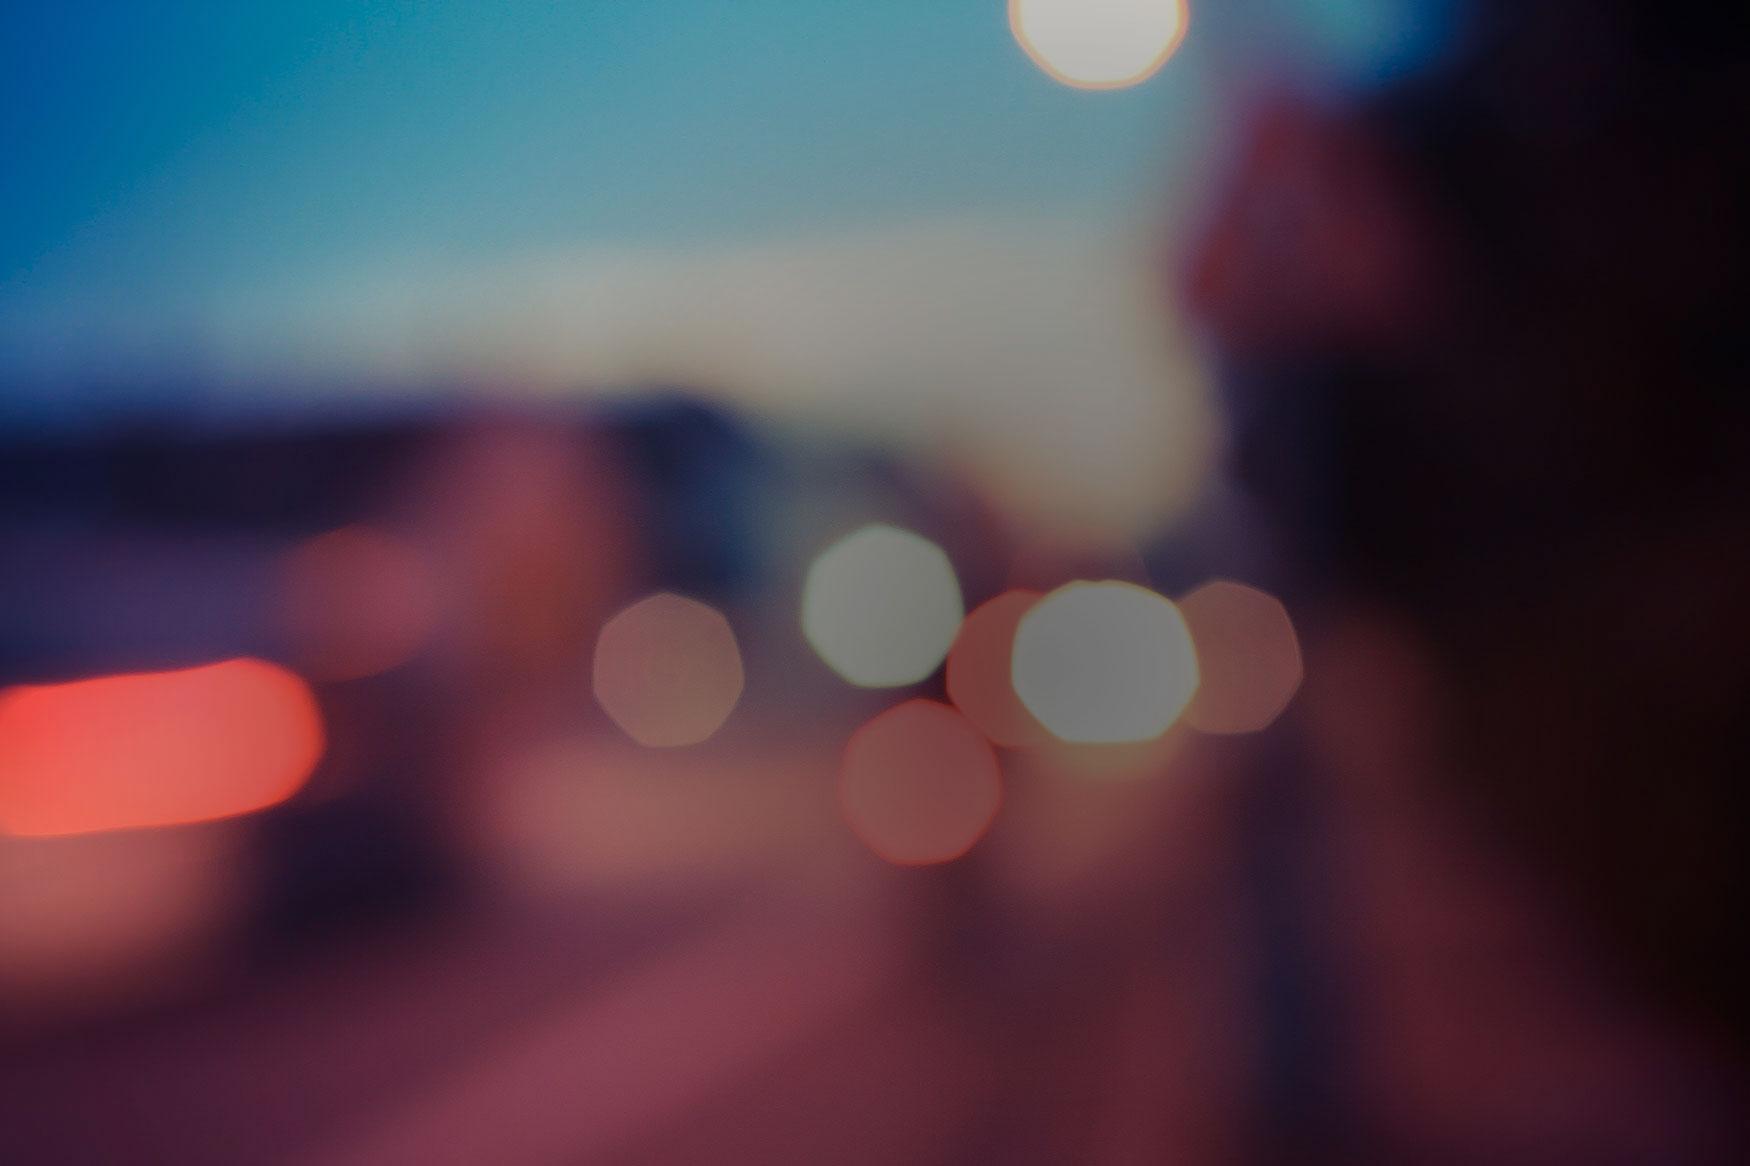 BL_lightsblur2